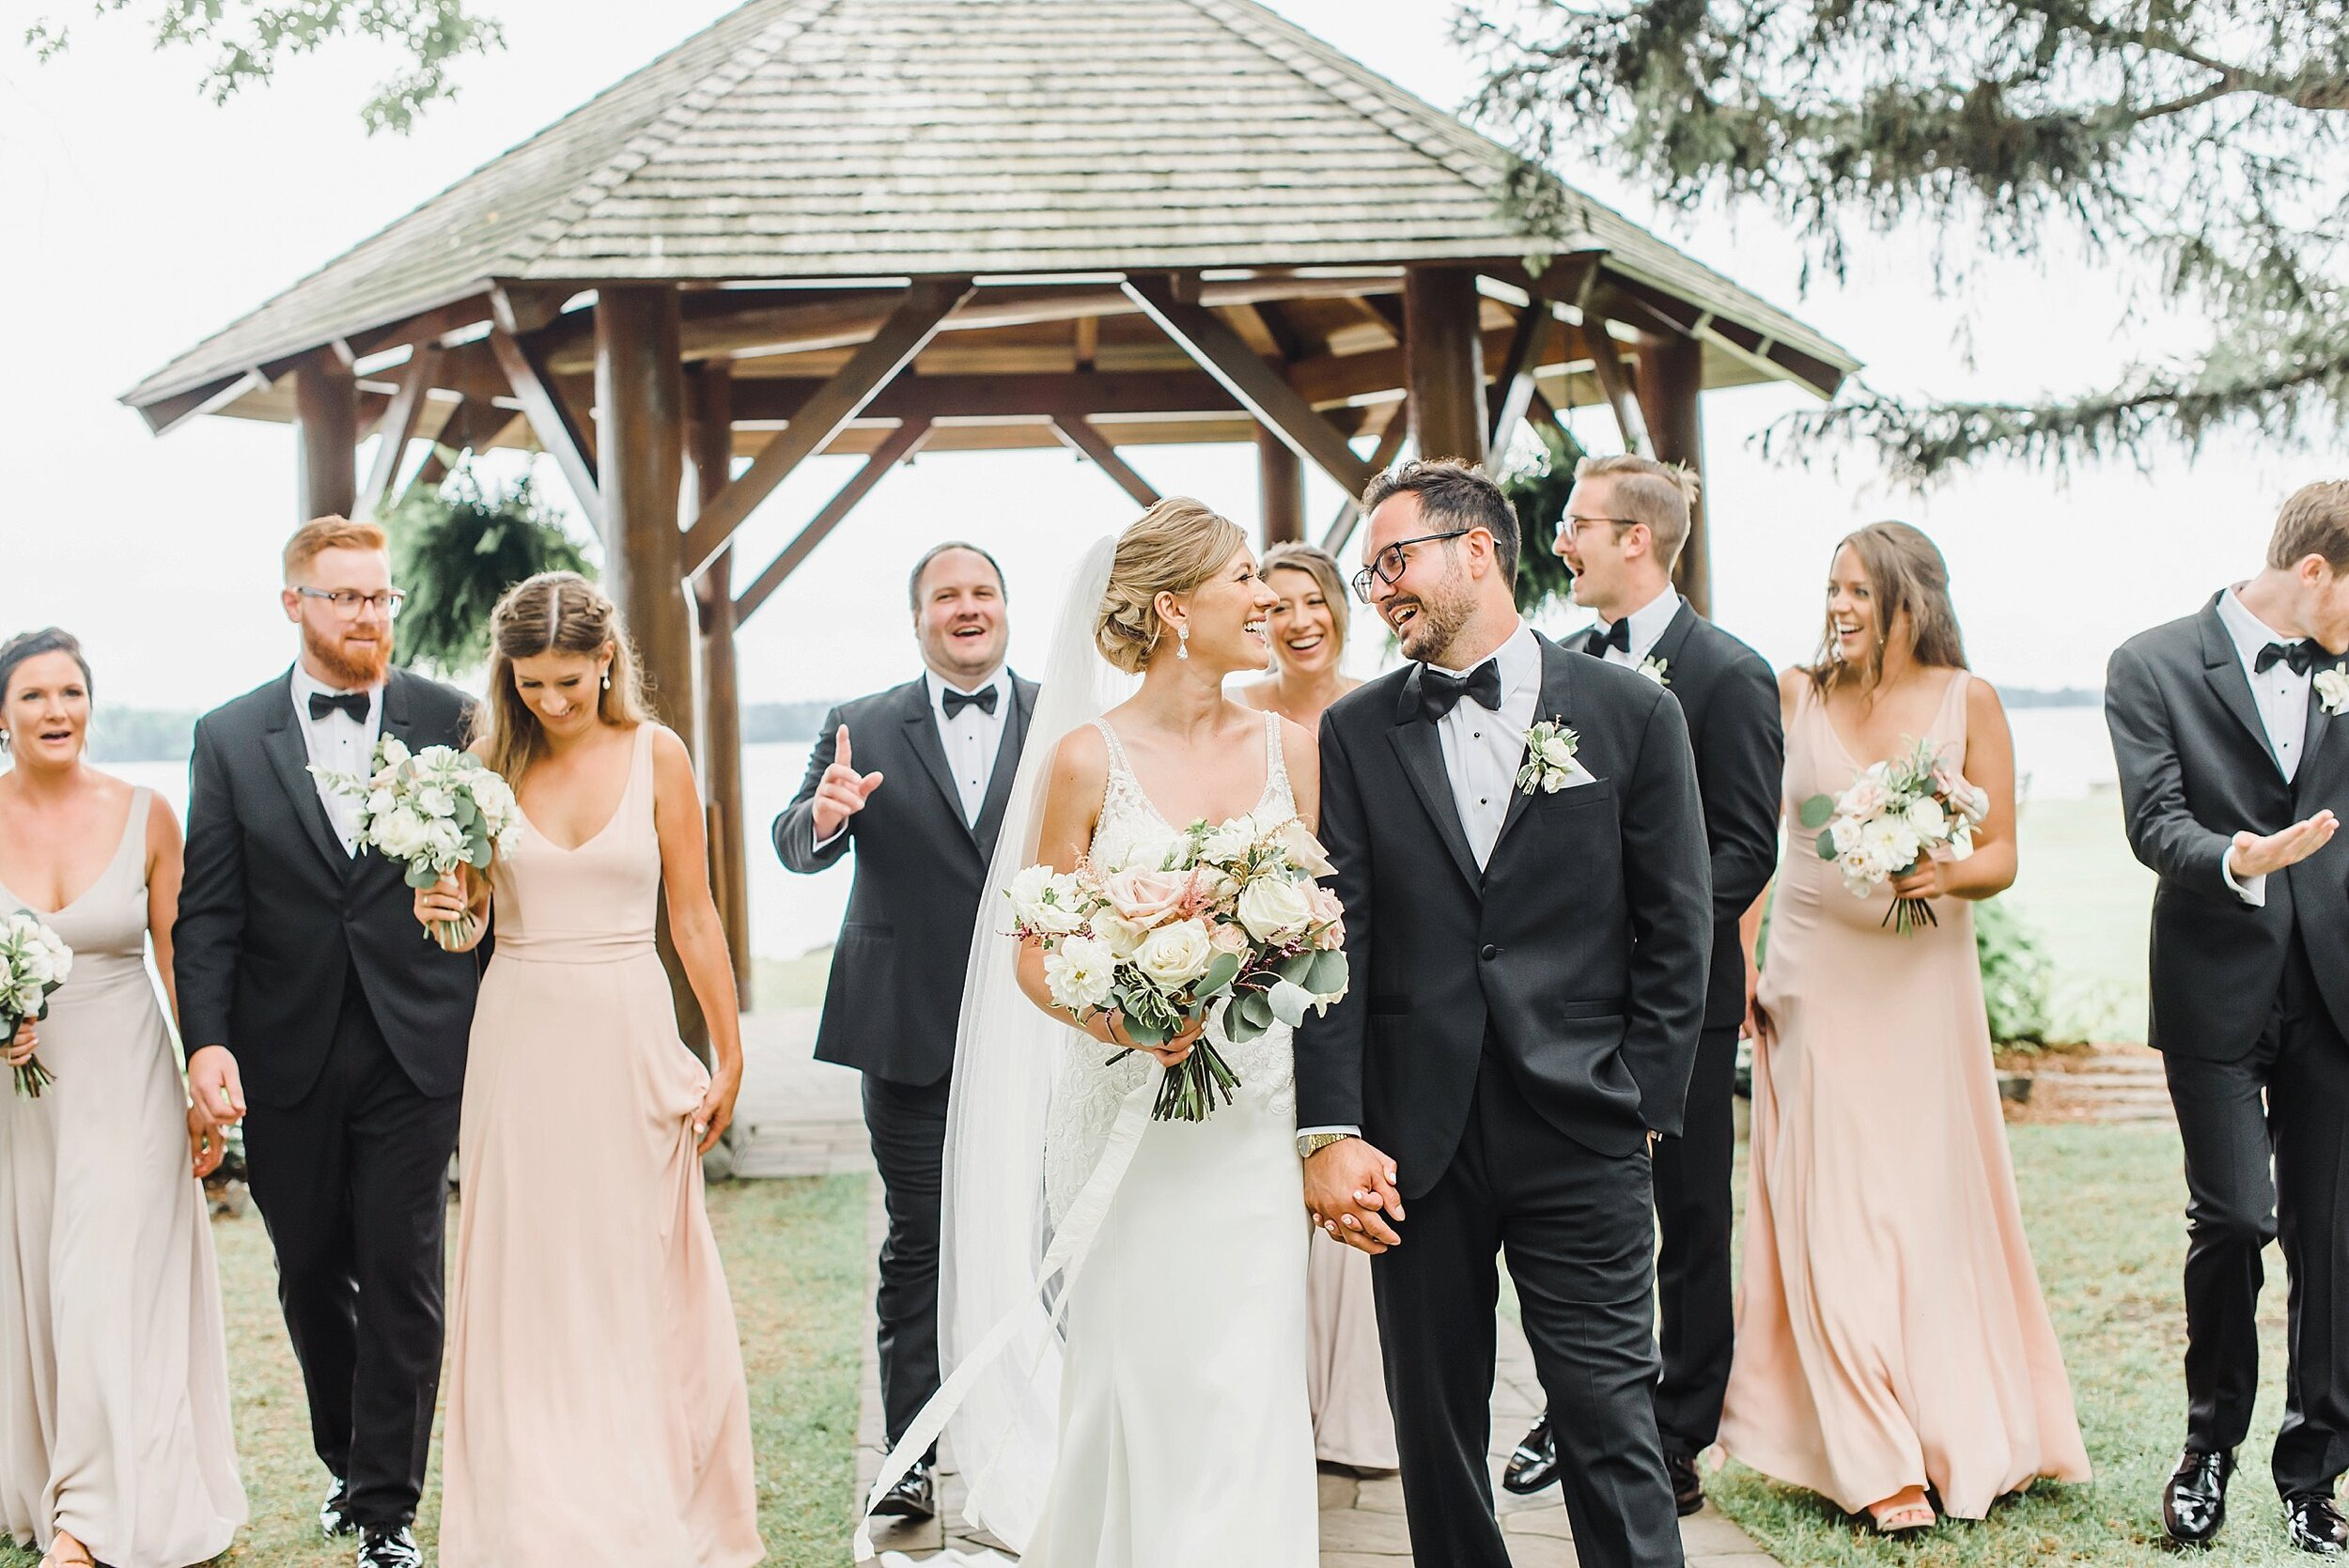 light airy fine art ottawa wedding photographer | Ali and Batoul Photography | Fairmont Le Chateau Montebello48.jpg